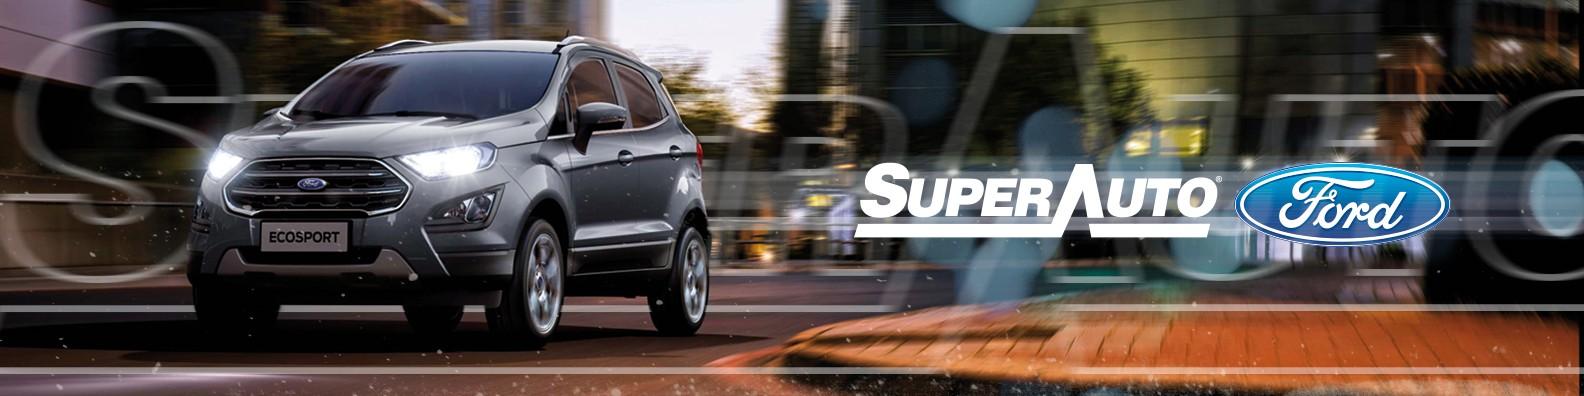 Ford Superauto Linkedin